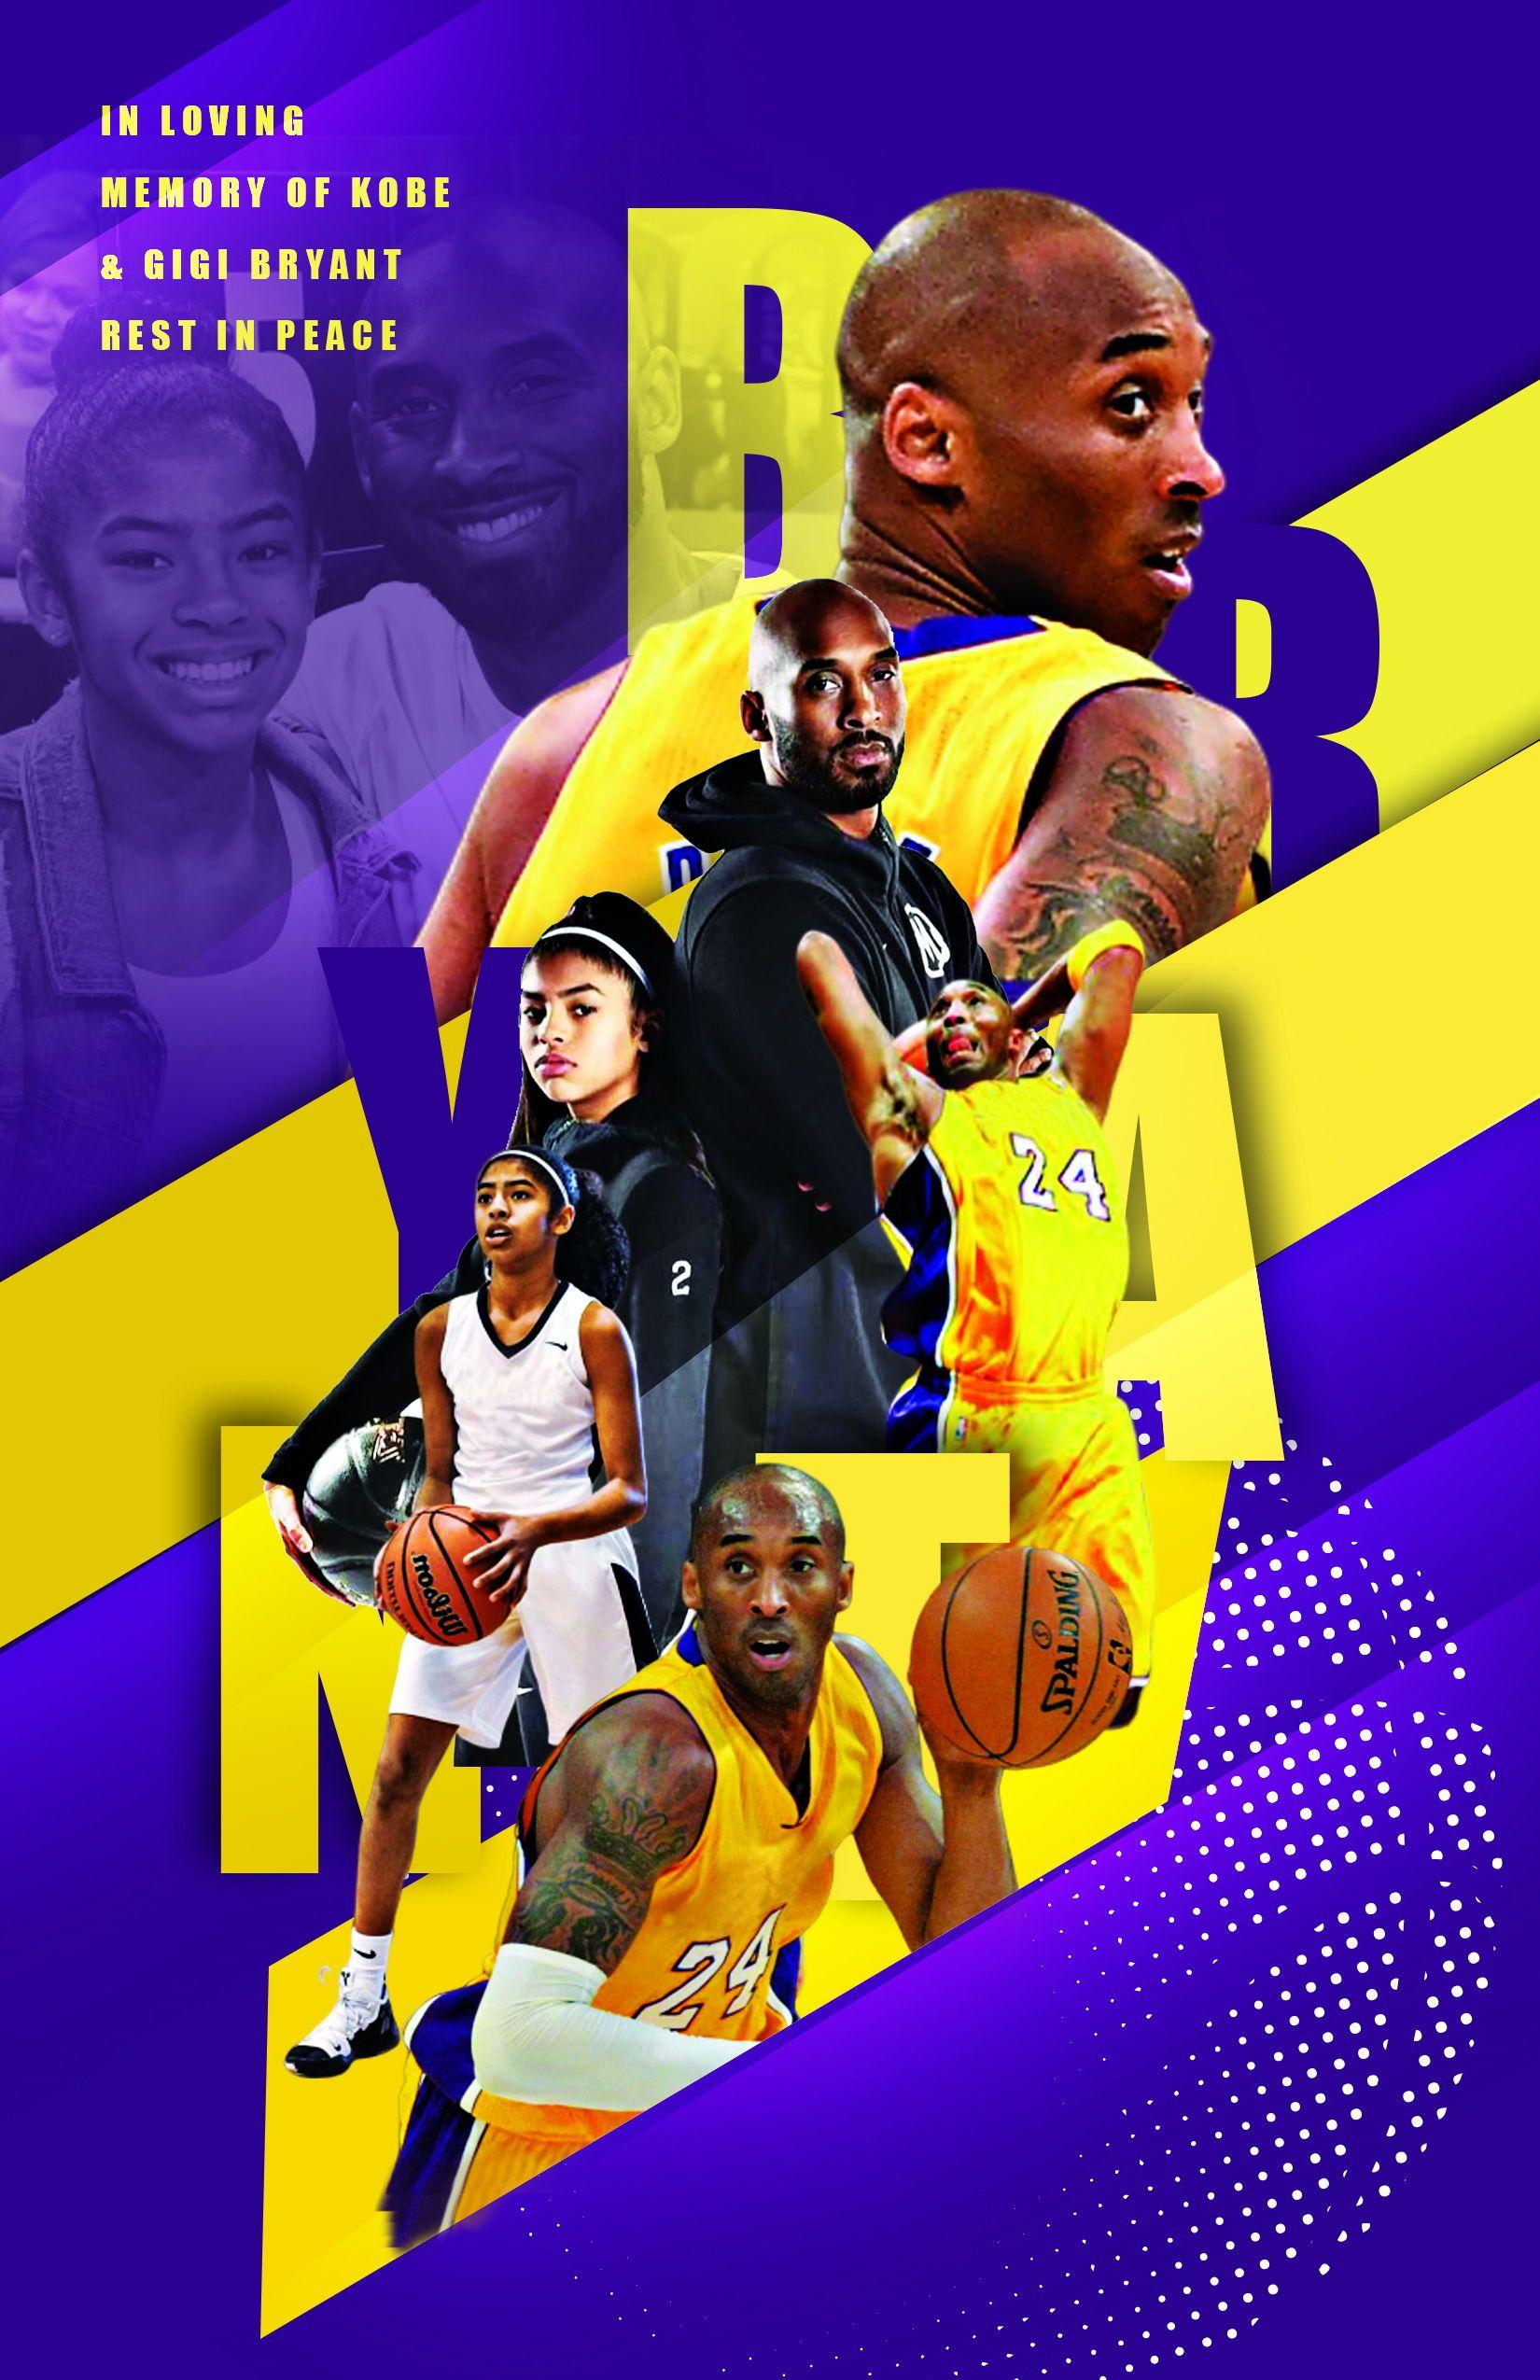 Kobe Bryant Poster Basketball Poster Kobe Gigi Bryant In 2020 Kobe Bryant Poster Kobe Bryant Kobe Bryant Pictures